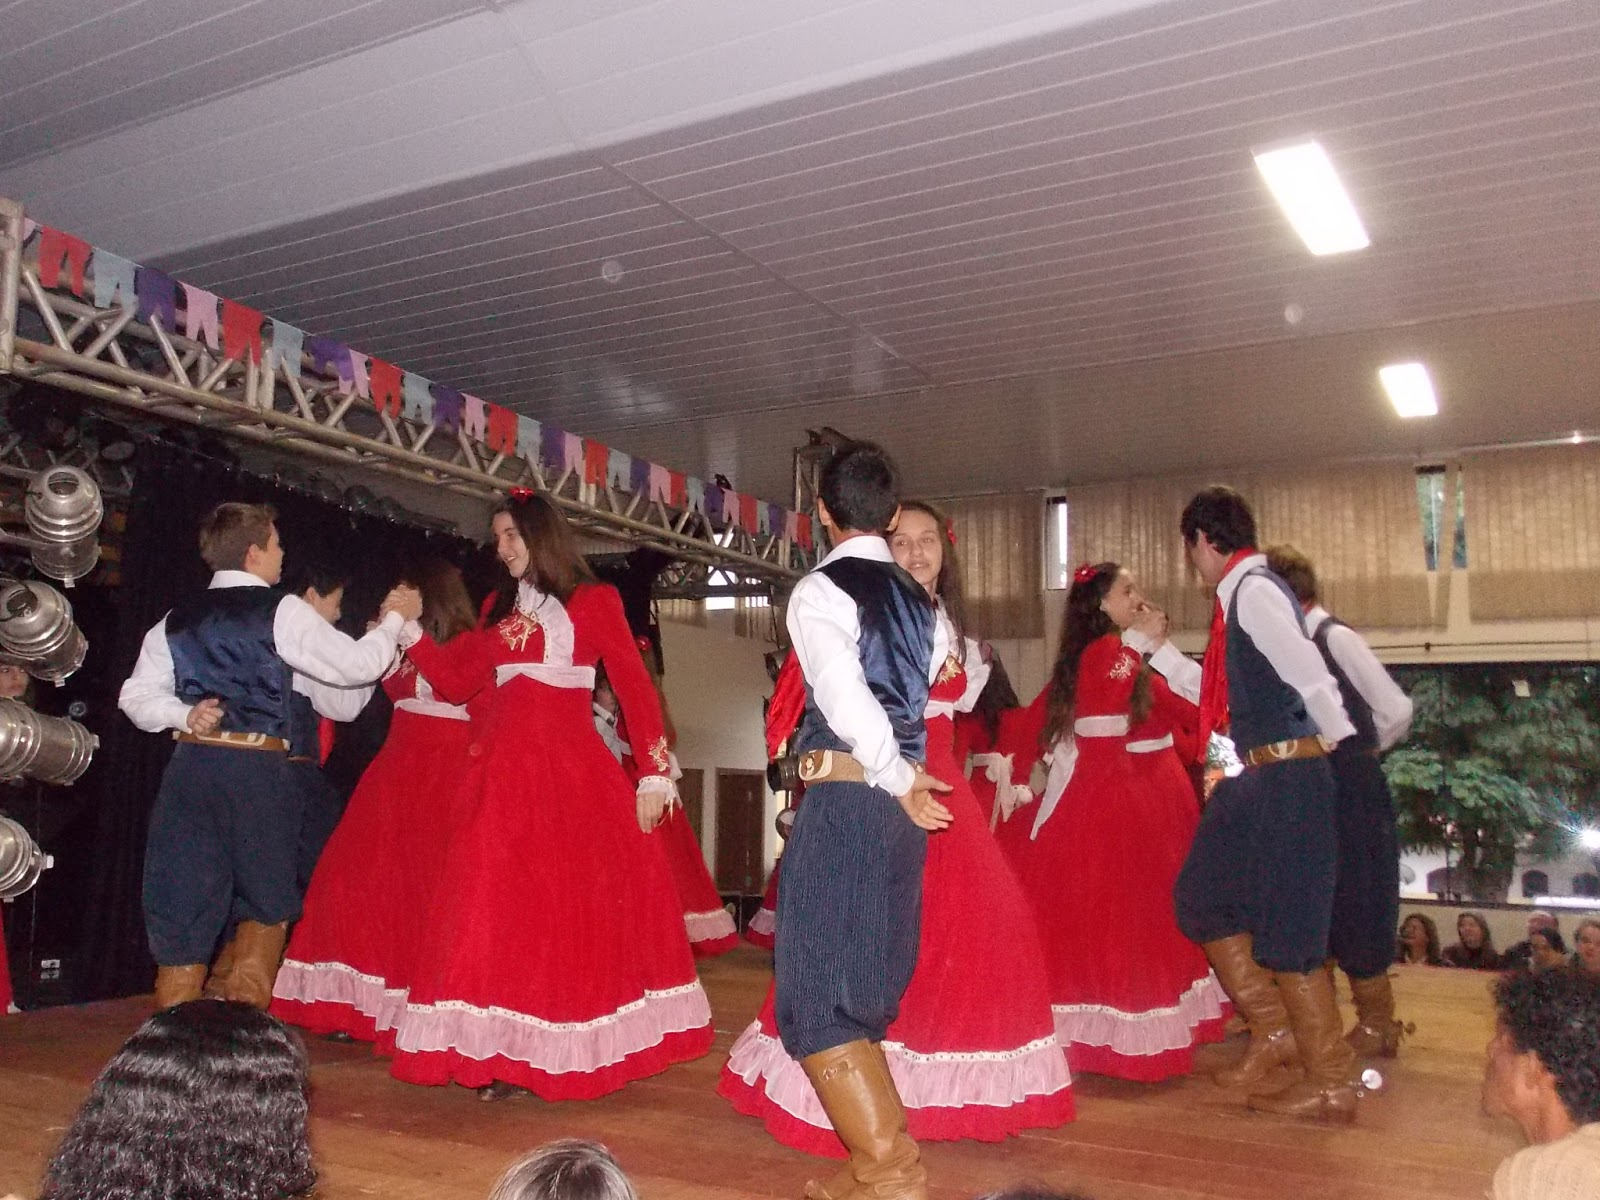 Circuito Festa Junina Uberlandia : Meuamigorico vii festoart etapa classificatória do